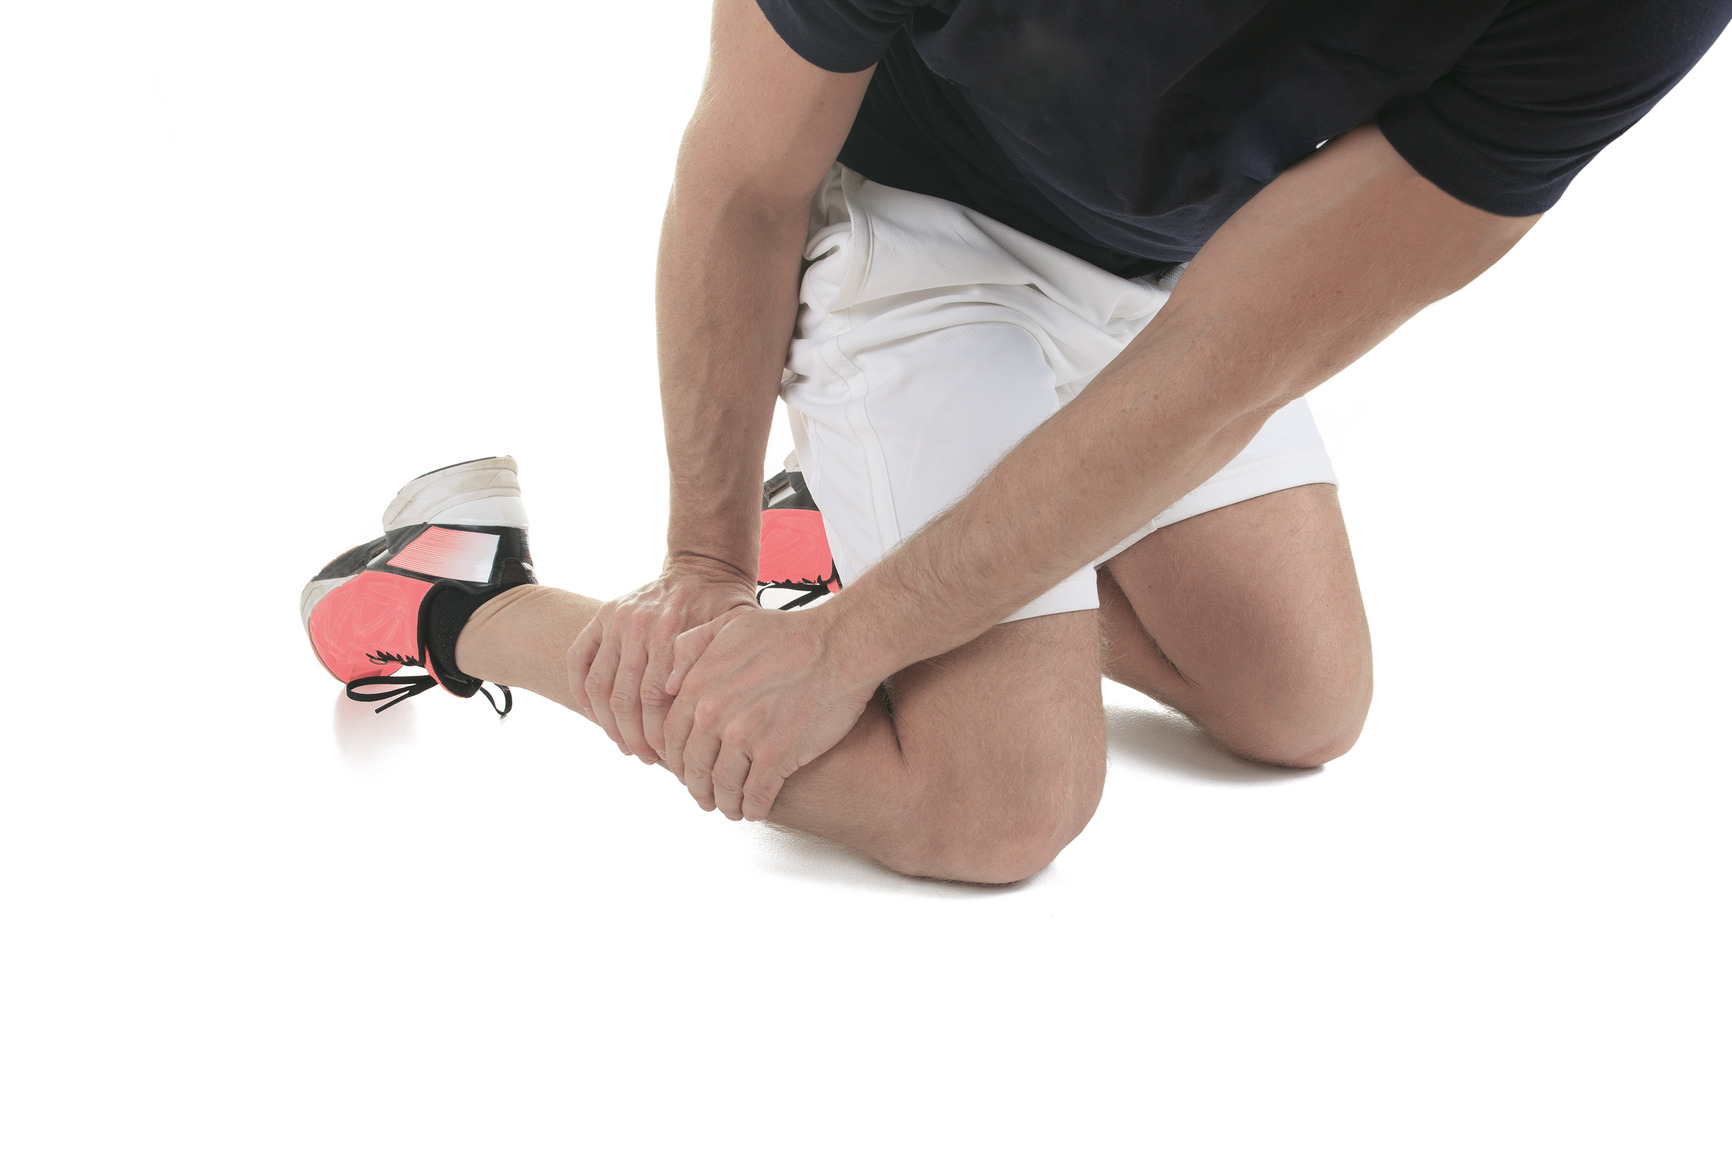 photodune-10880486-running-physical-injury-leg-muscle-pain-in-studio-m